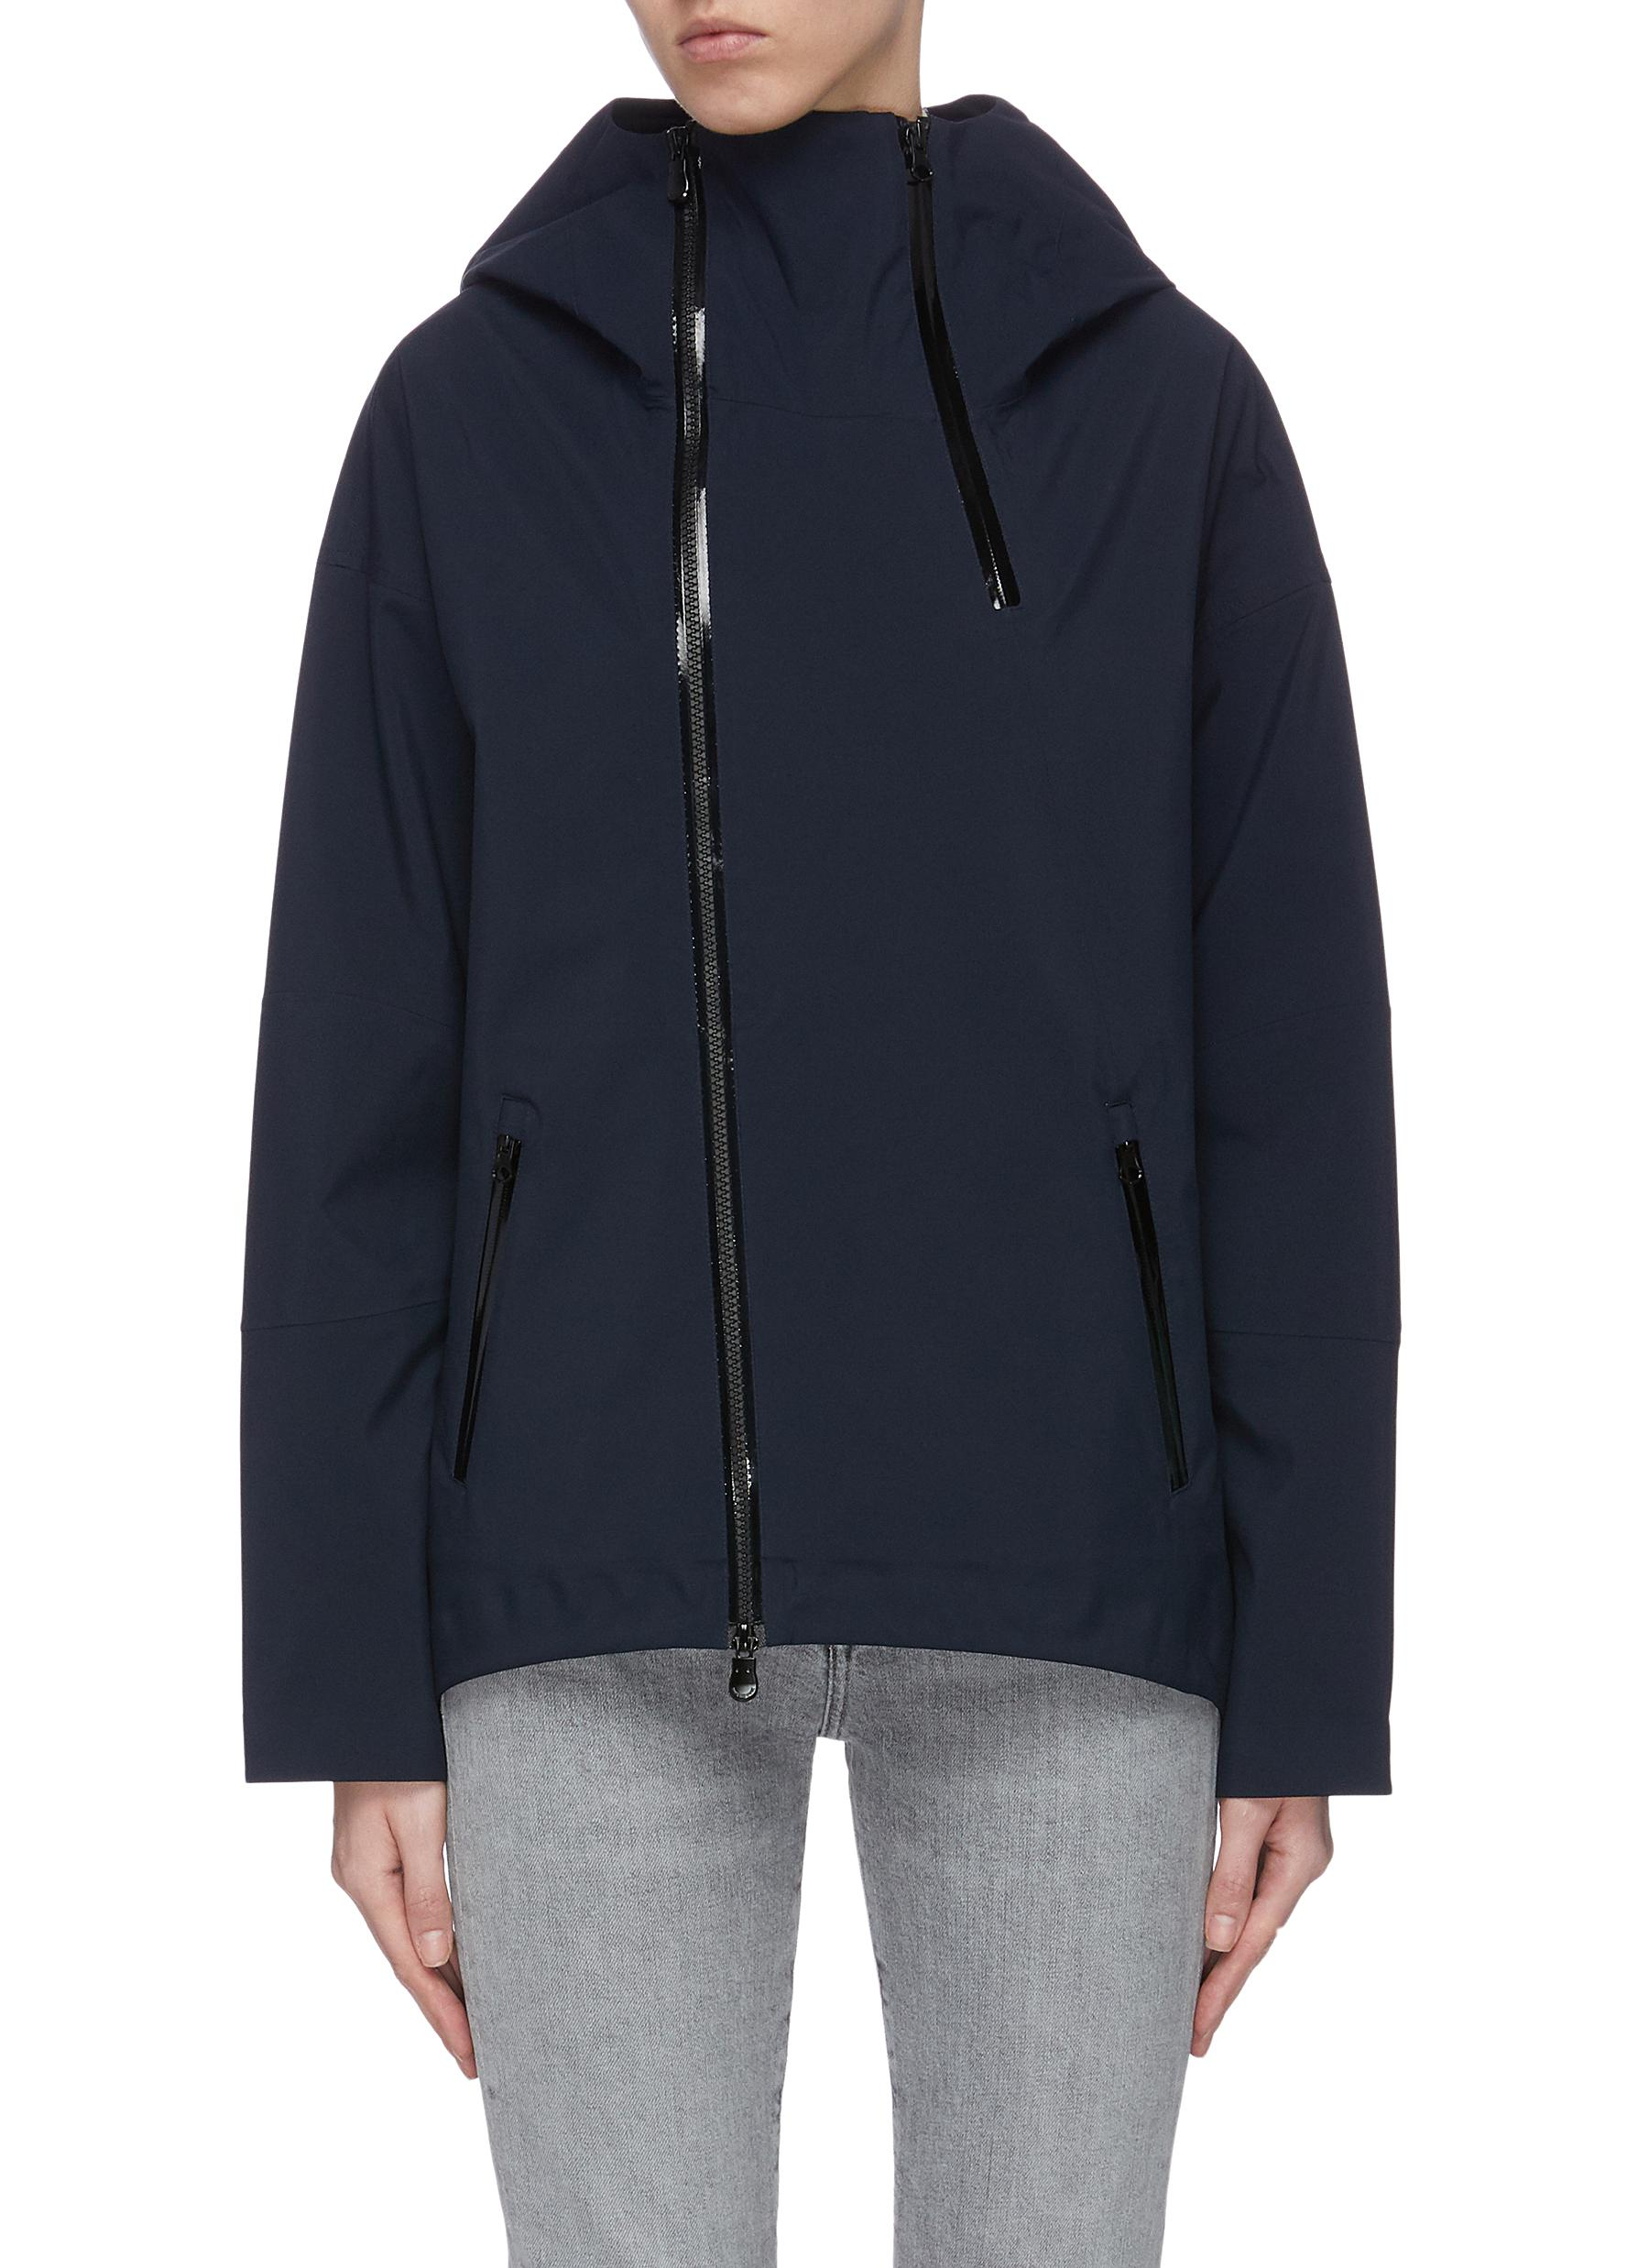 Buy Save The Duck Jackets 'Grinx' asymmetric zip shell jacket